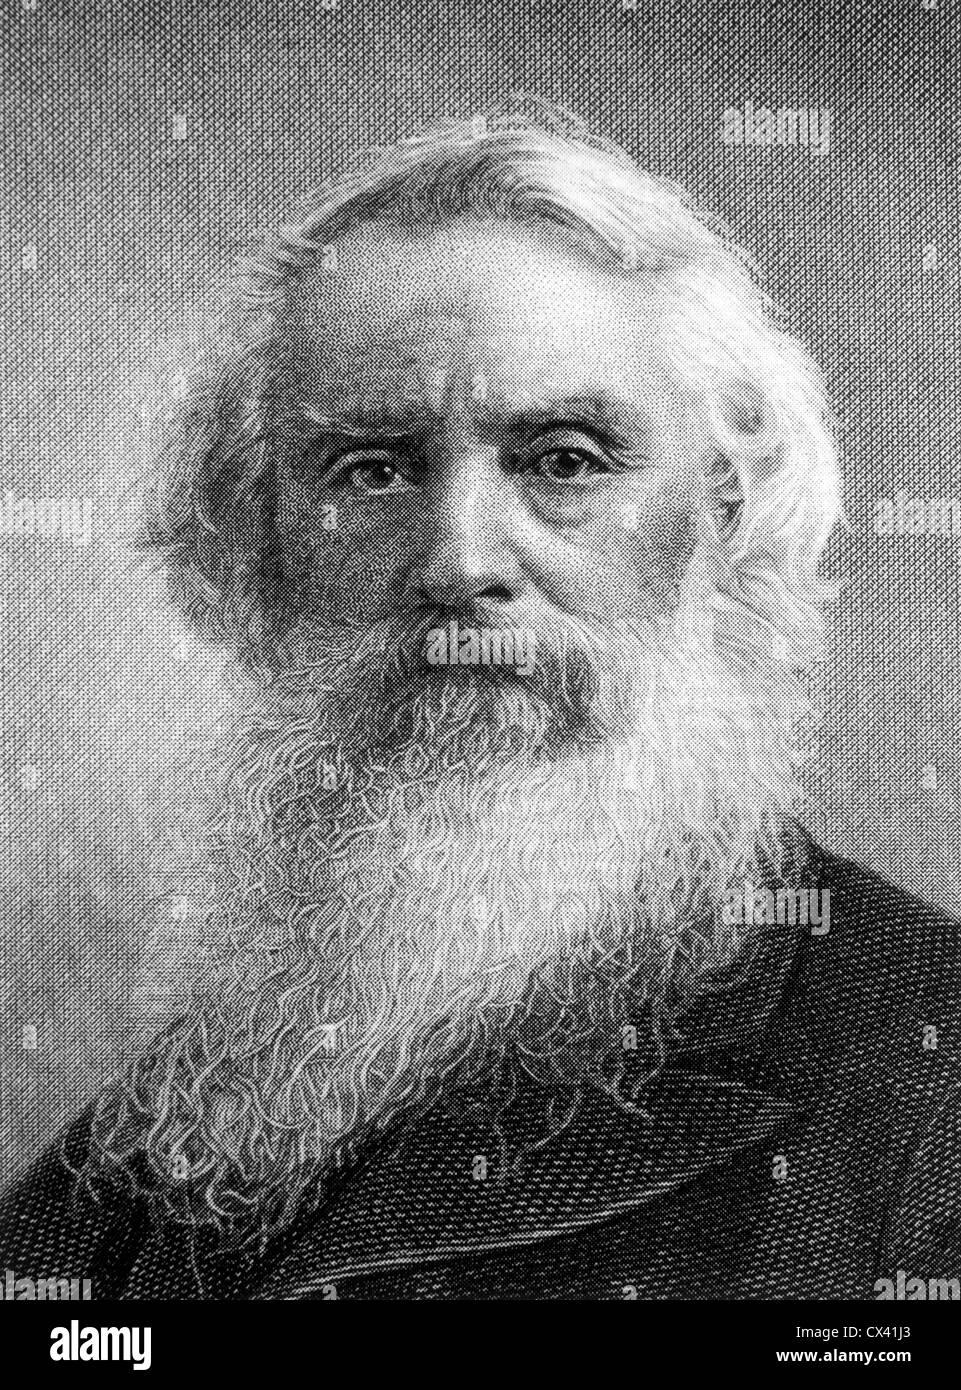 Samuel F. B. Morse (1791-1872), American Inventor, Portrait - Stock Image